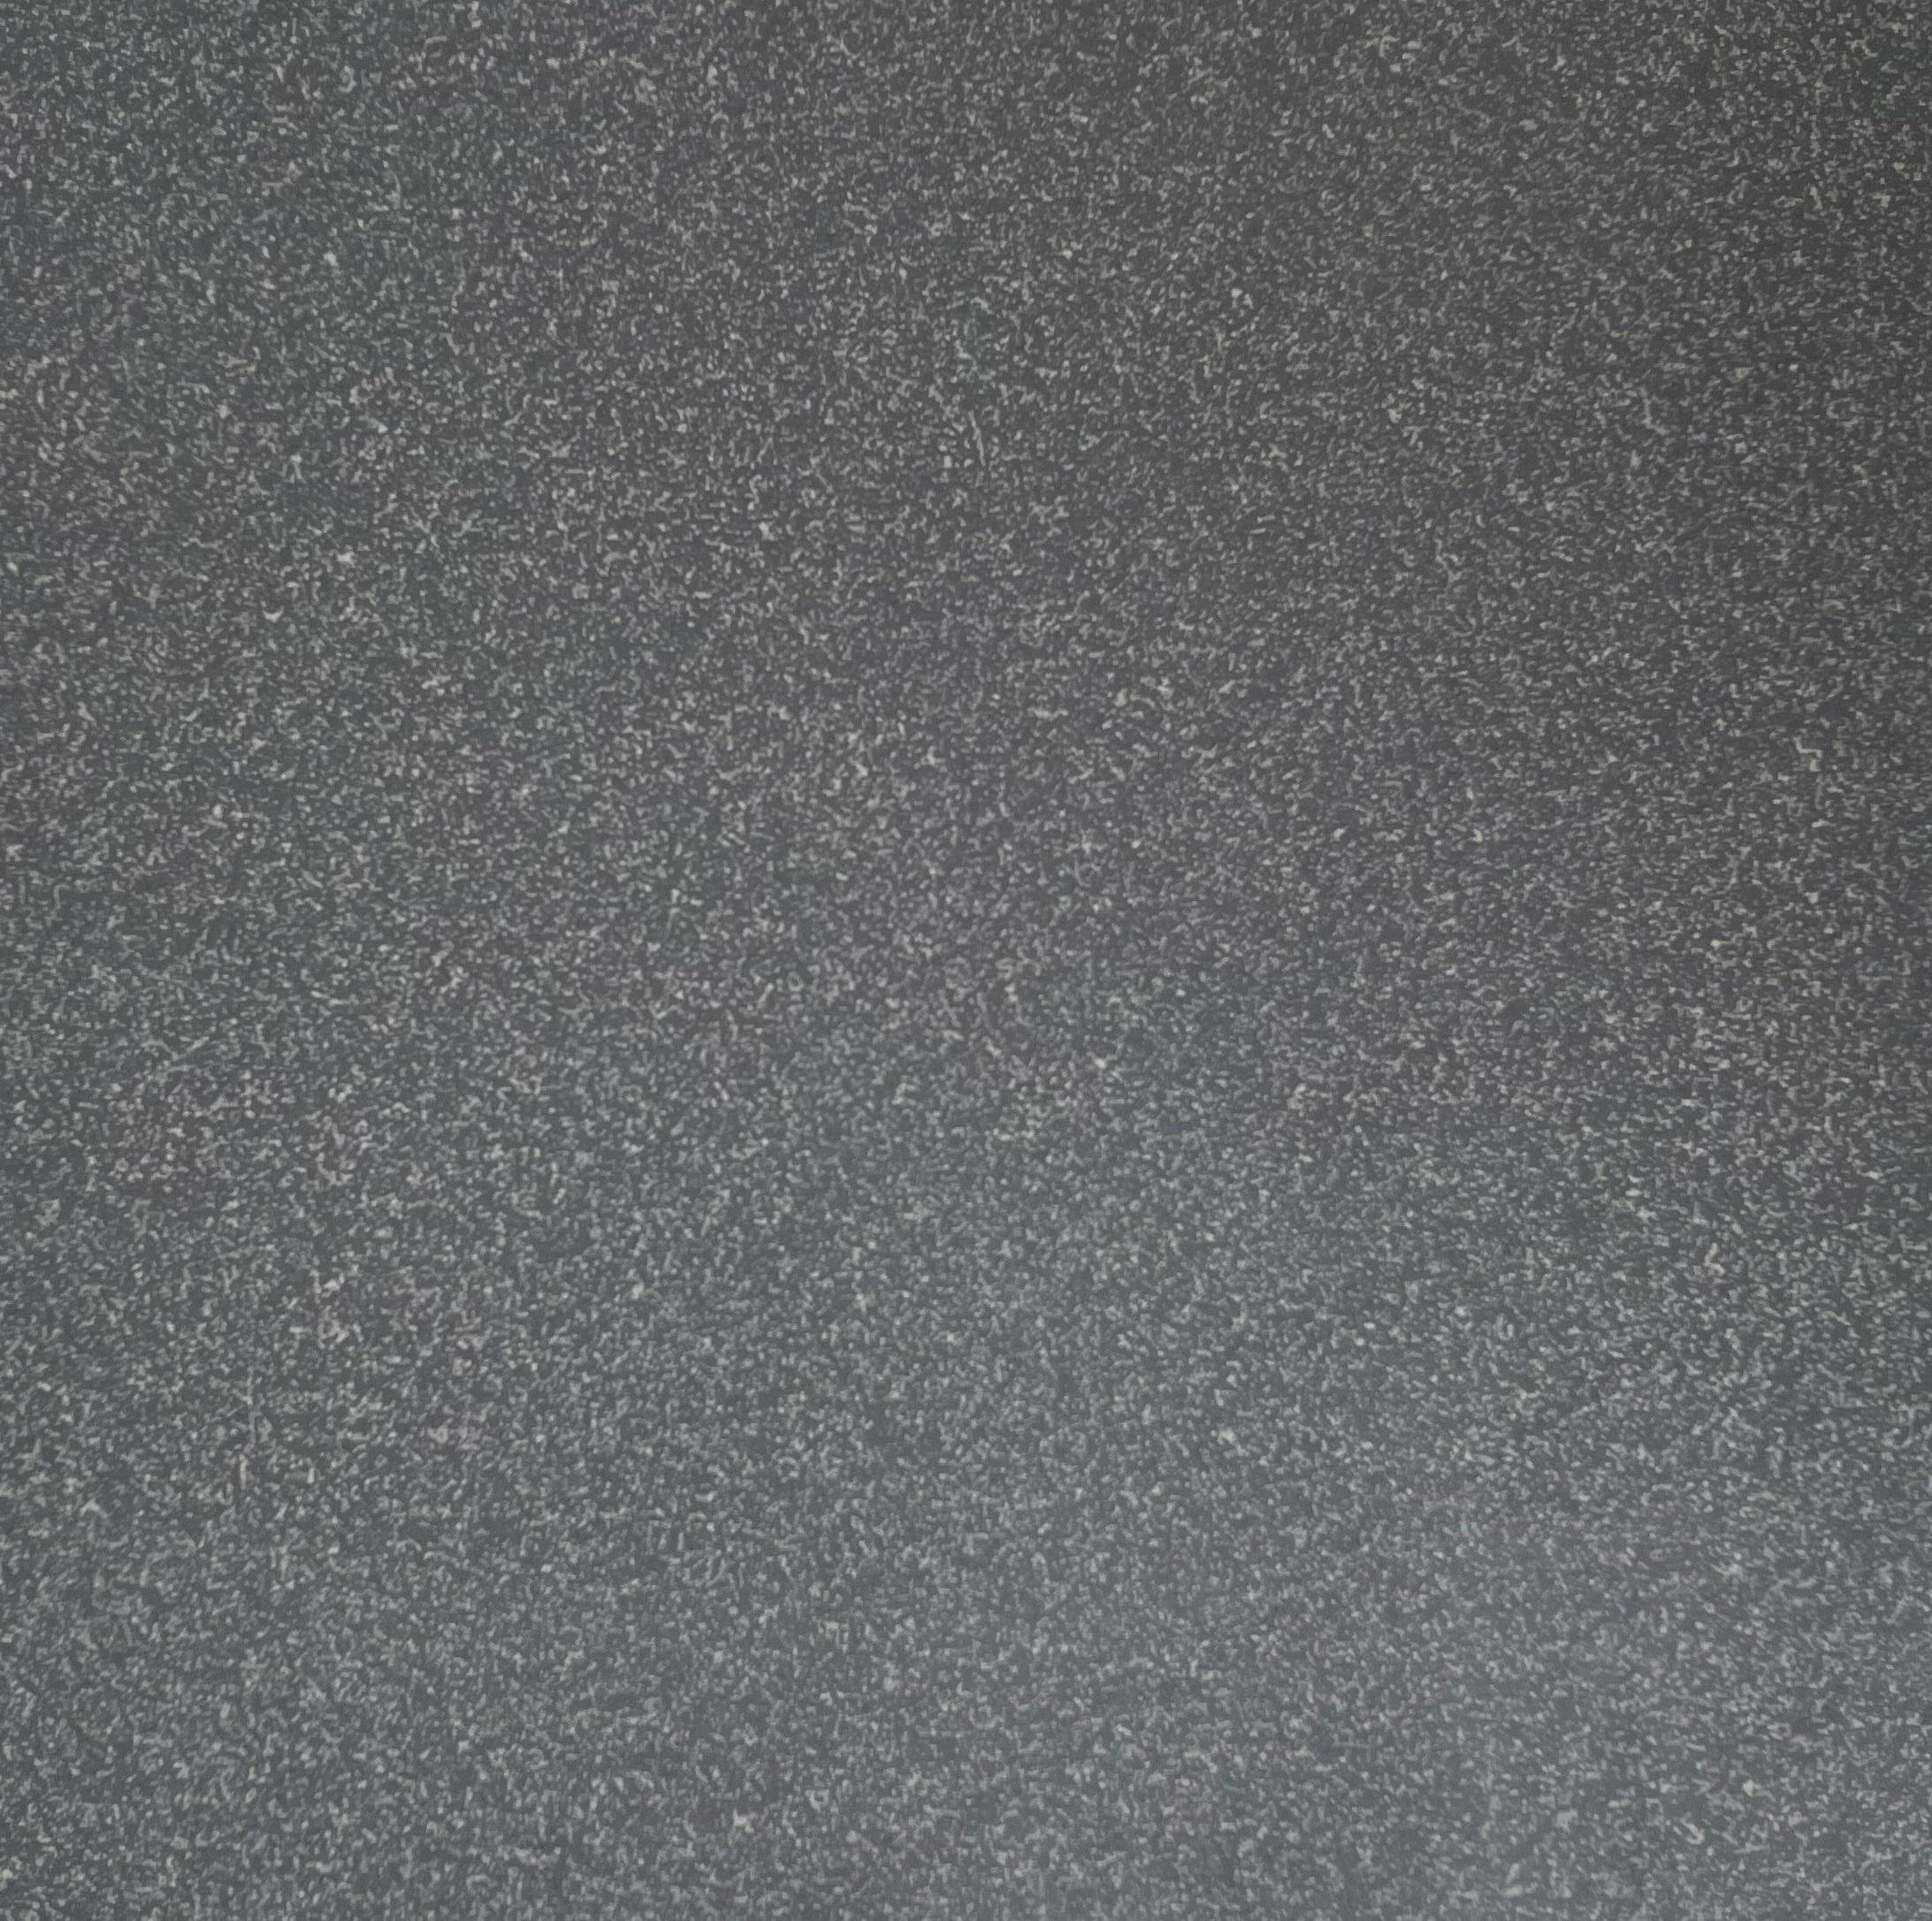 MPS Pandora Etna schwarz 30x30cm Bodenfliese R10